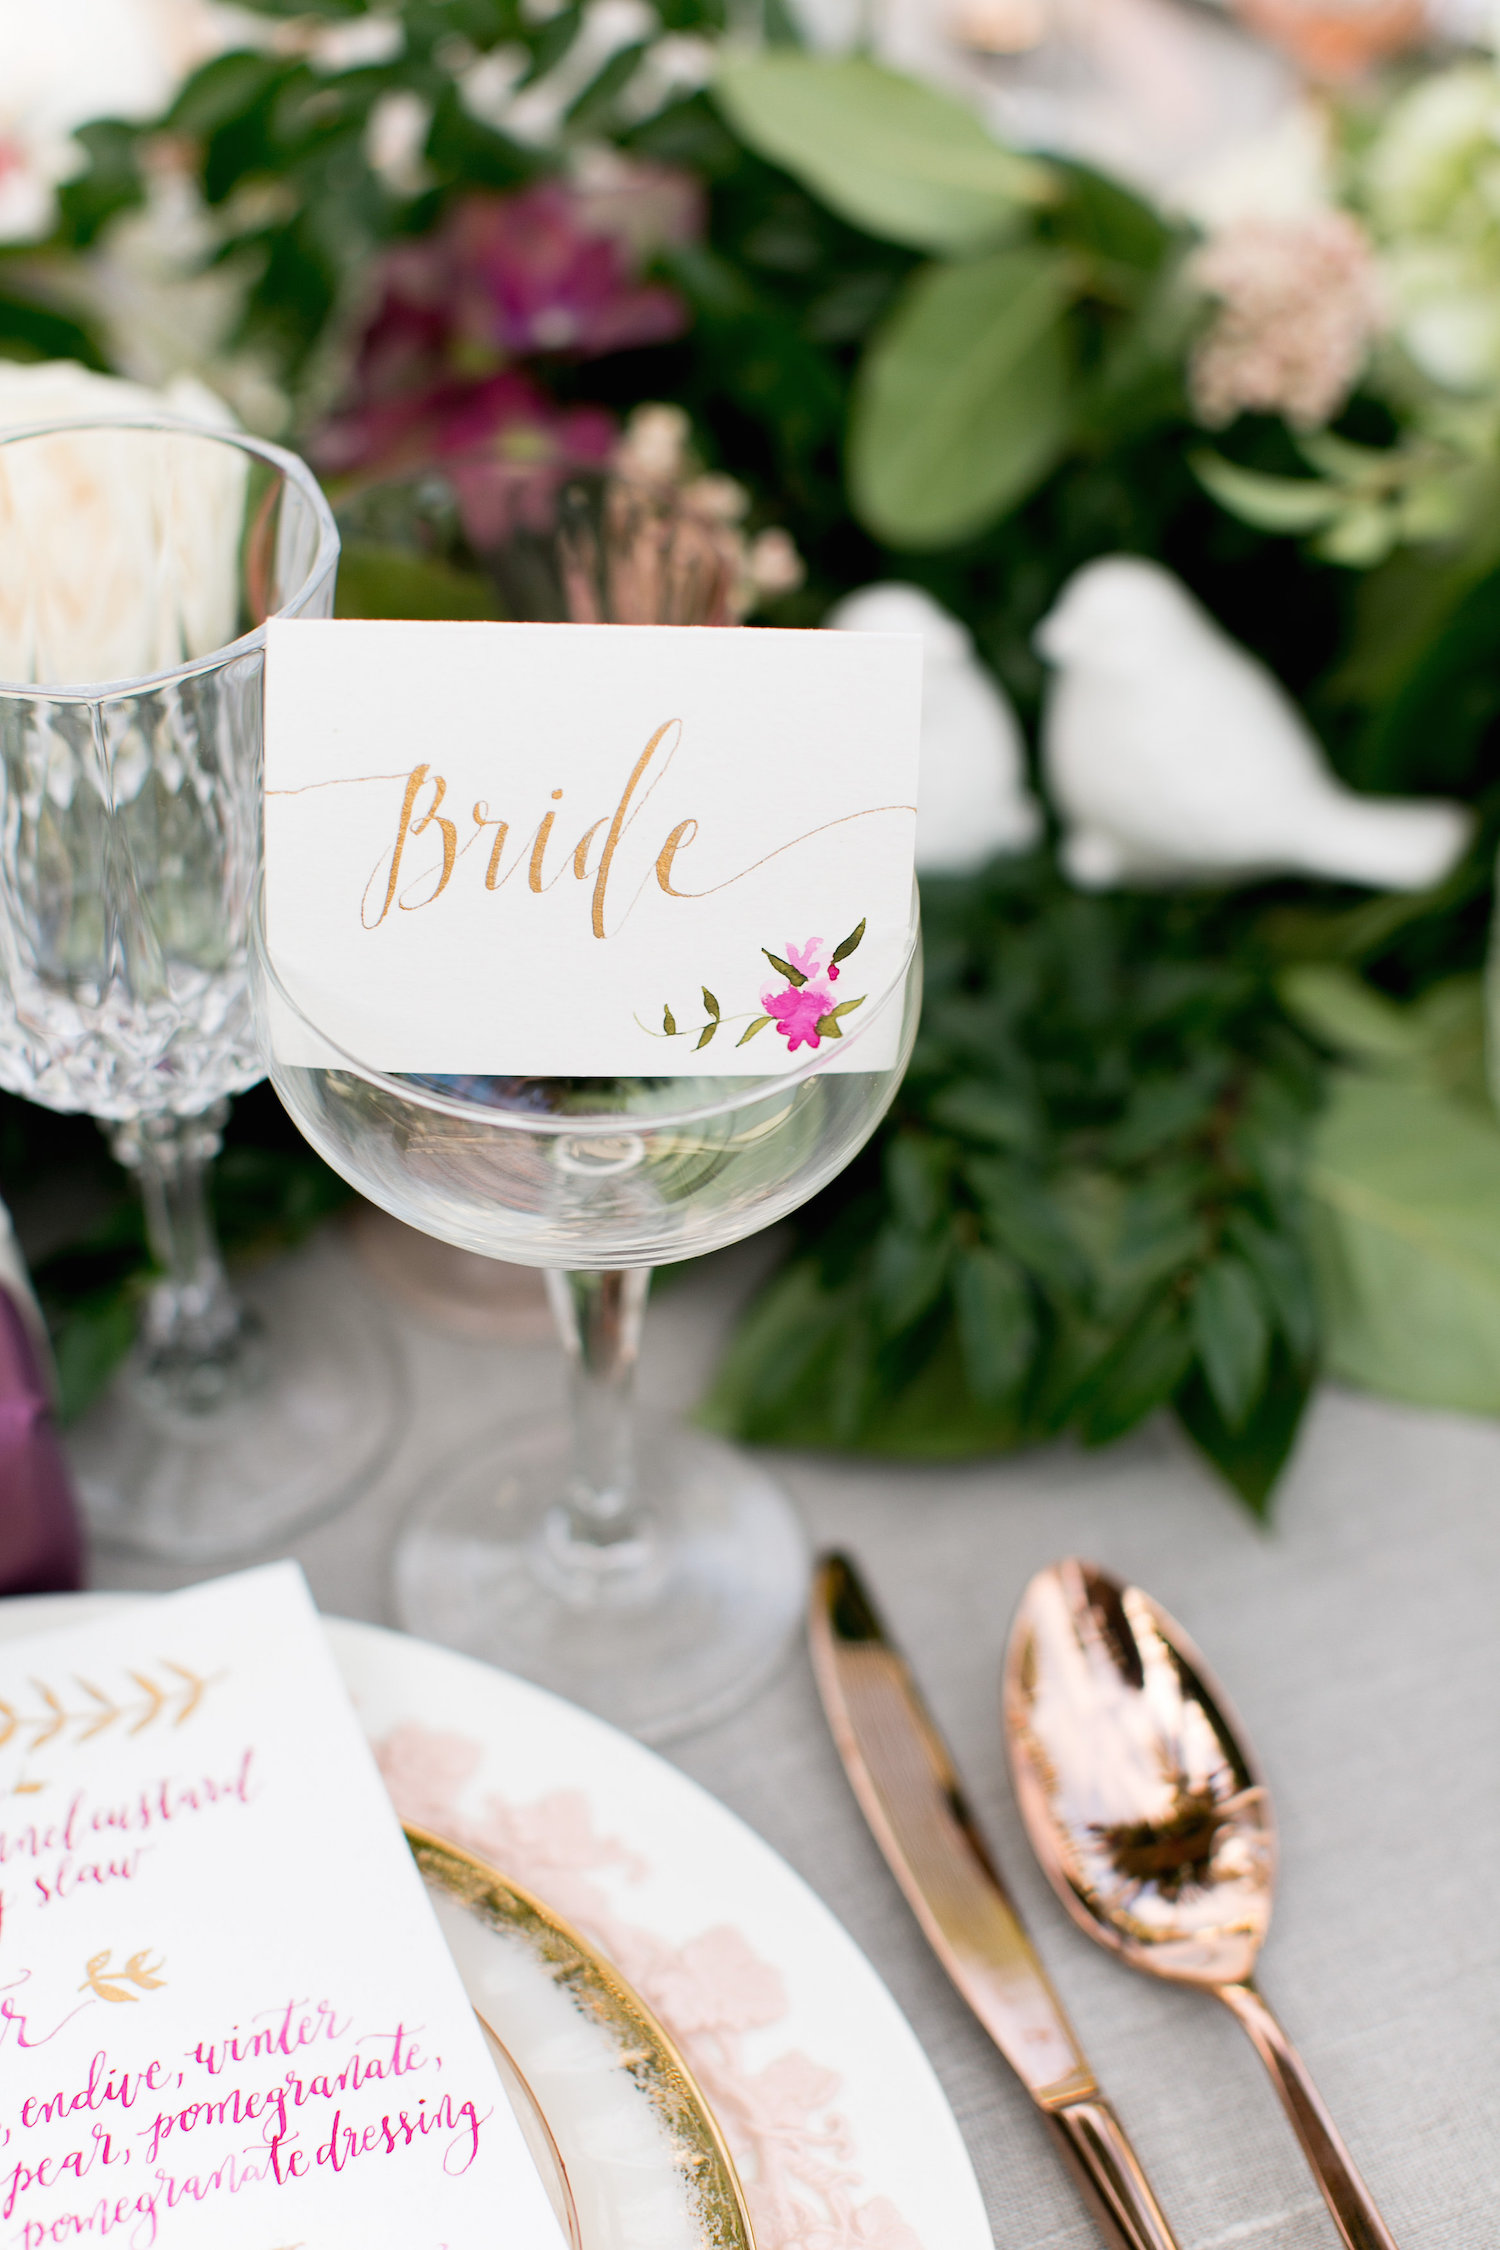 Wedding details by San Diego planner, Sweet Blossom Weddings.